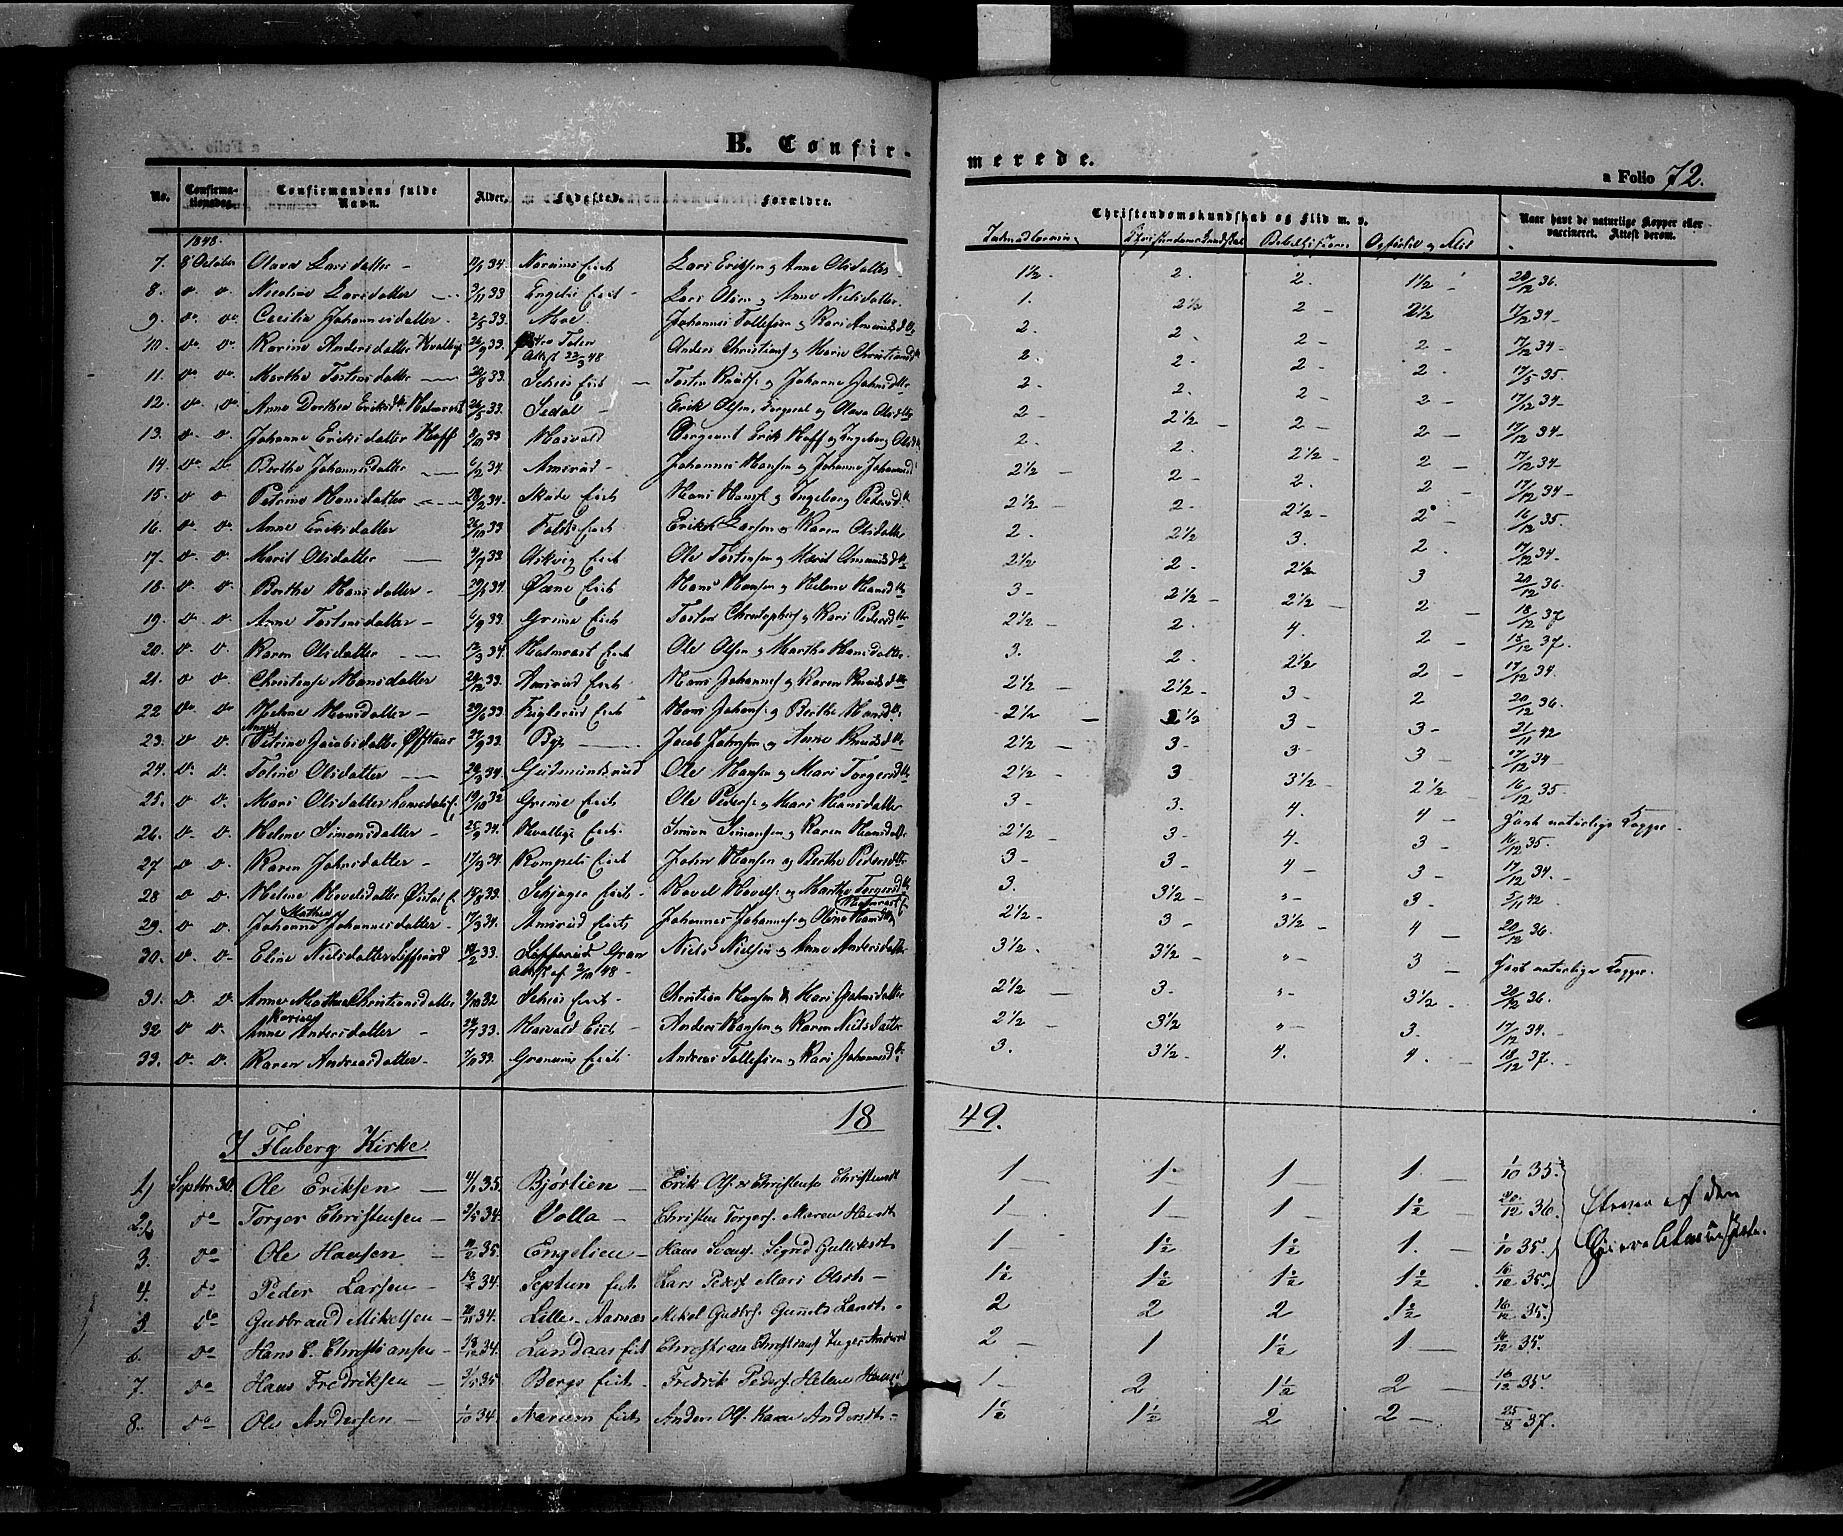 SAH, Land prestekontor, Ministerialbok nr. 9, 1847-1859, s. 72